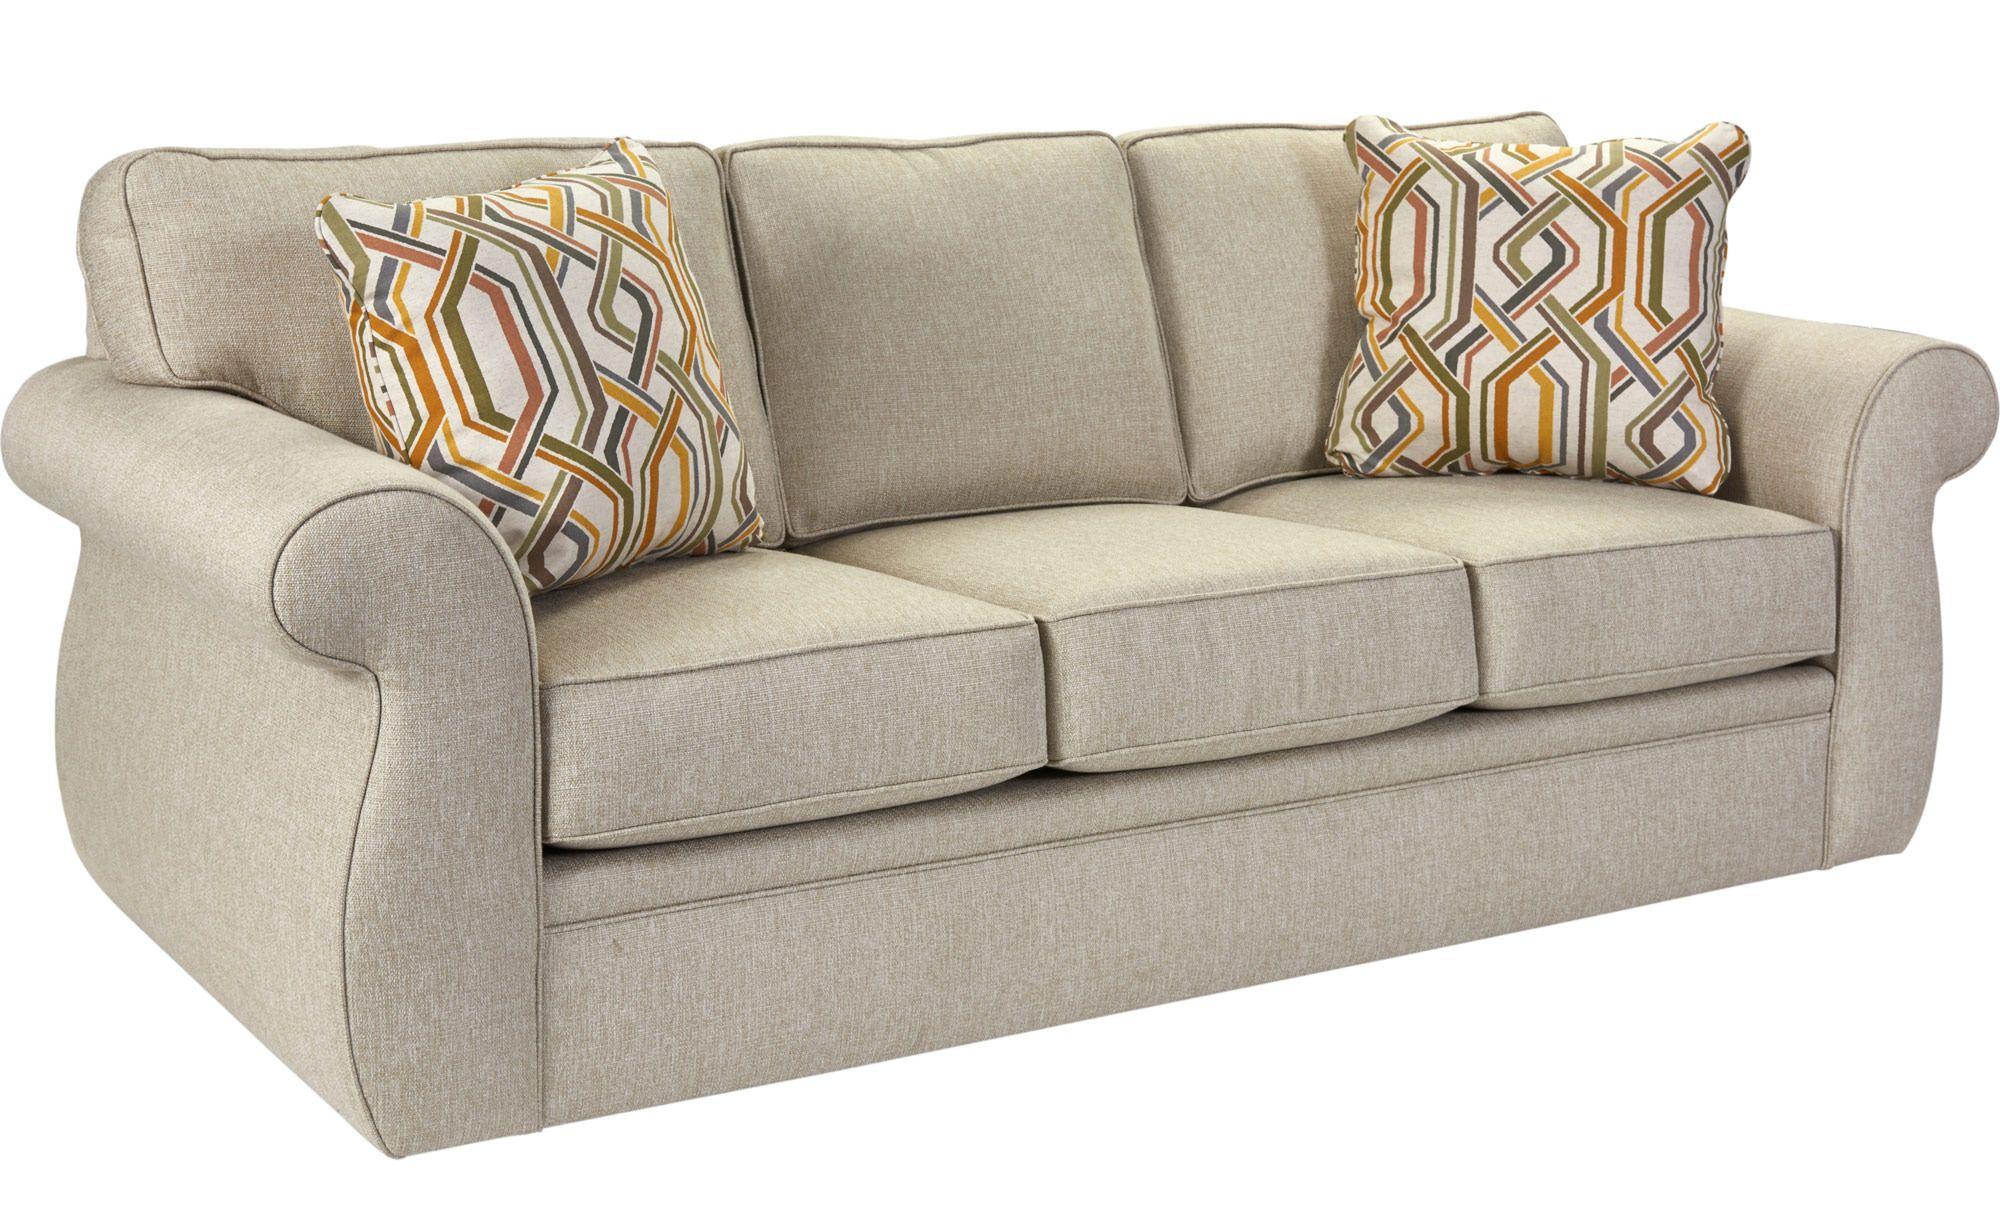 - Veronica Sunbrella Sofa By Broyhill - Home Gallery Stores